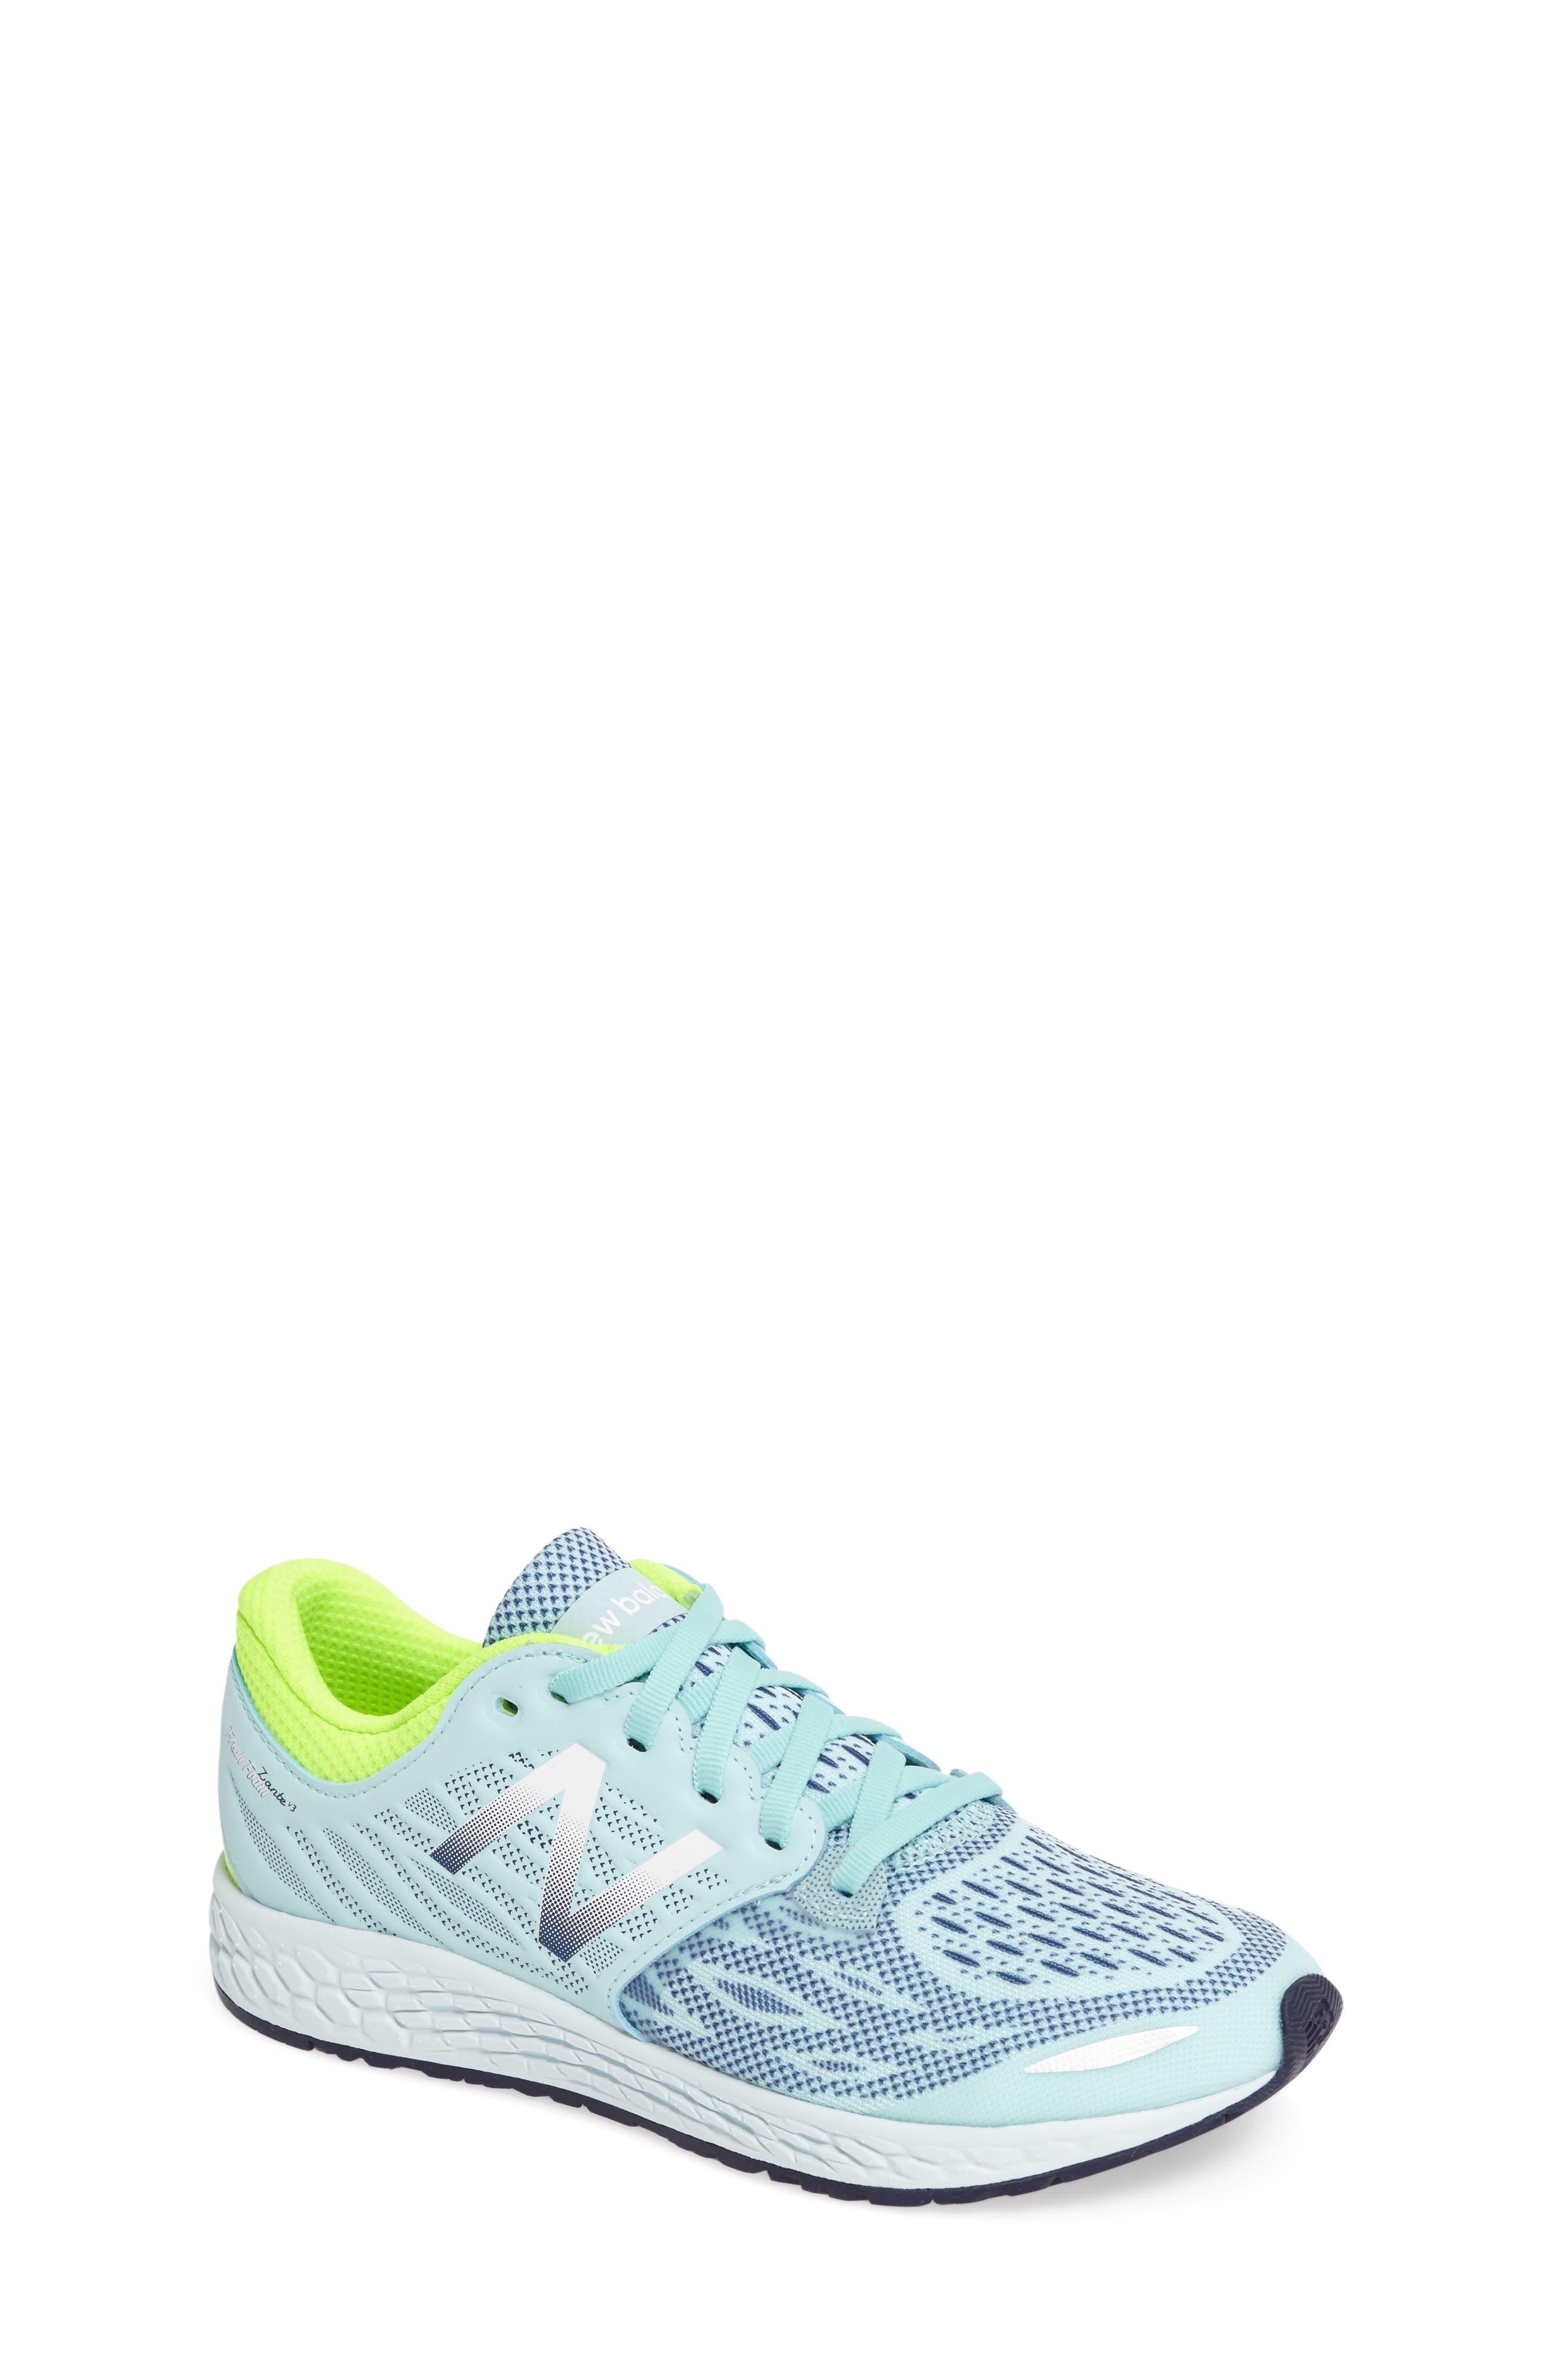 Fresh Foam Sneaker,                             Main thumbnail 1, color,                             445